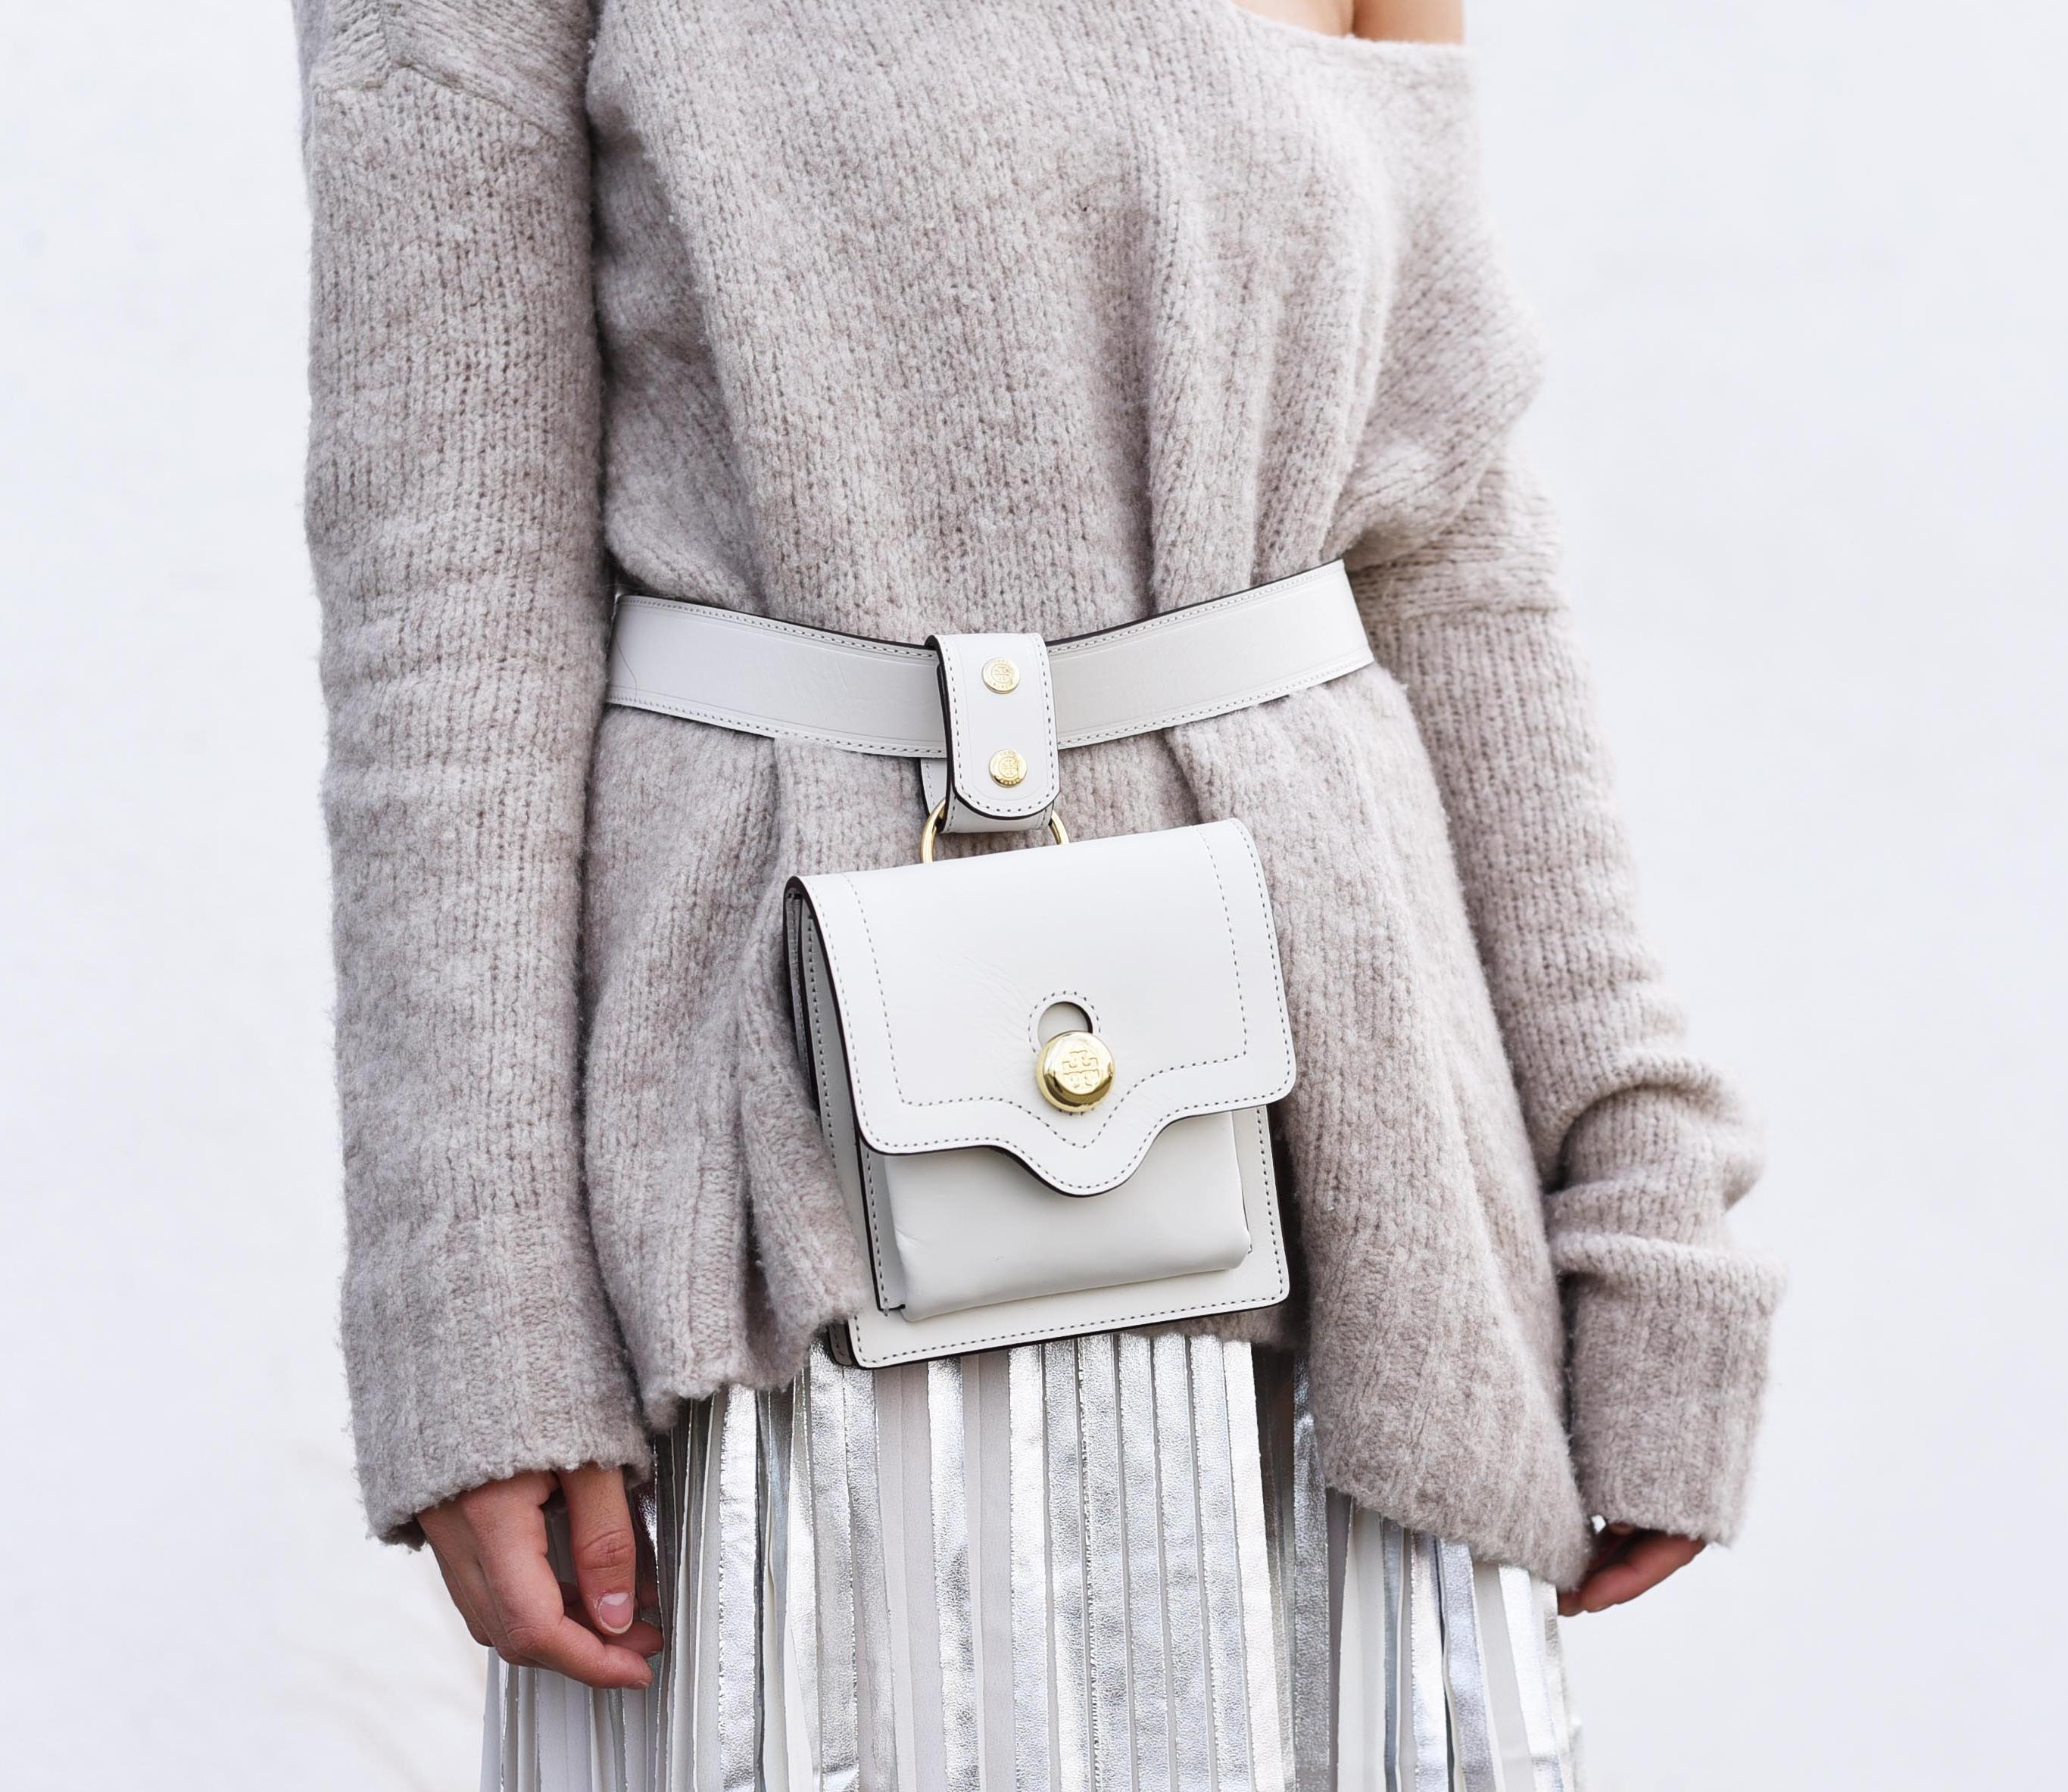 fashiioncarpet-belt-bag-tory-burch-white.jpg